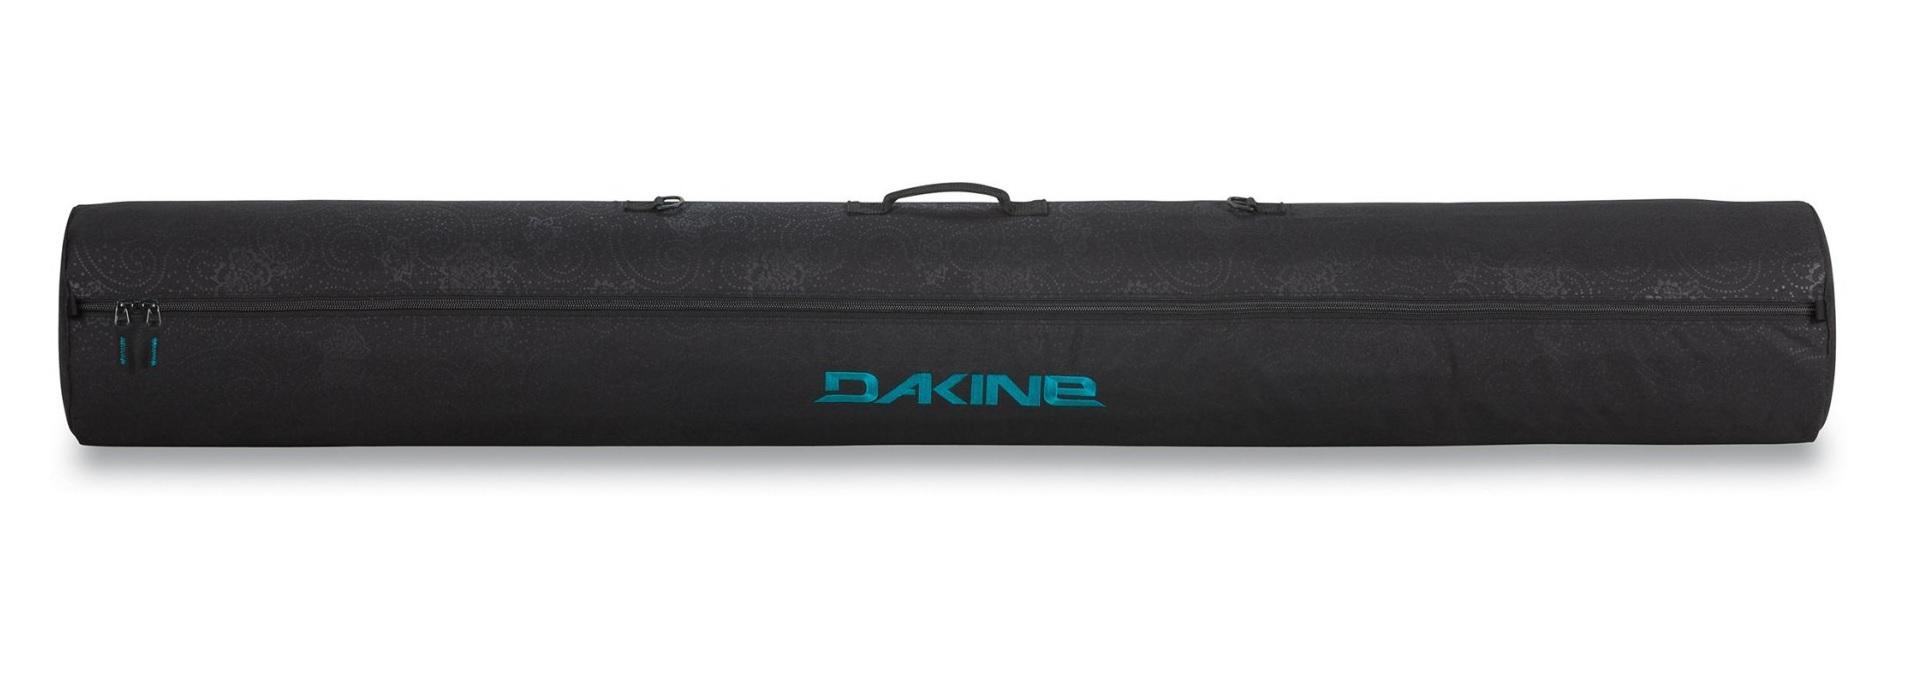 Чехол для горных лыж Dakine Padded Single, ellie II, 175 см